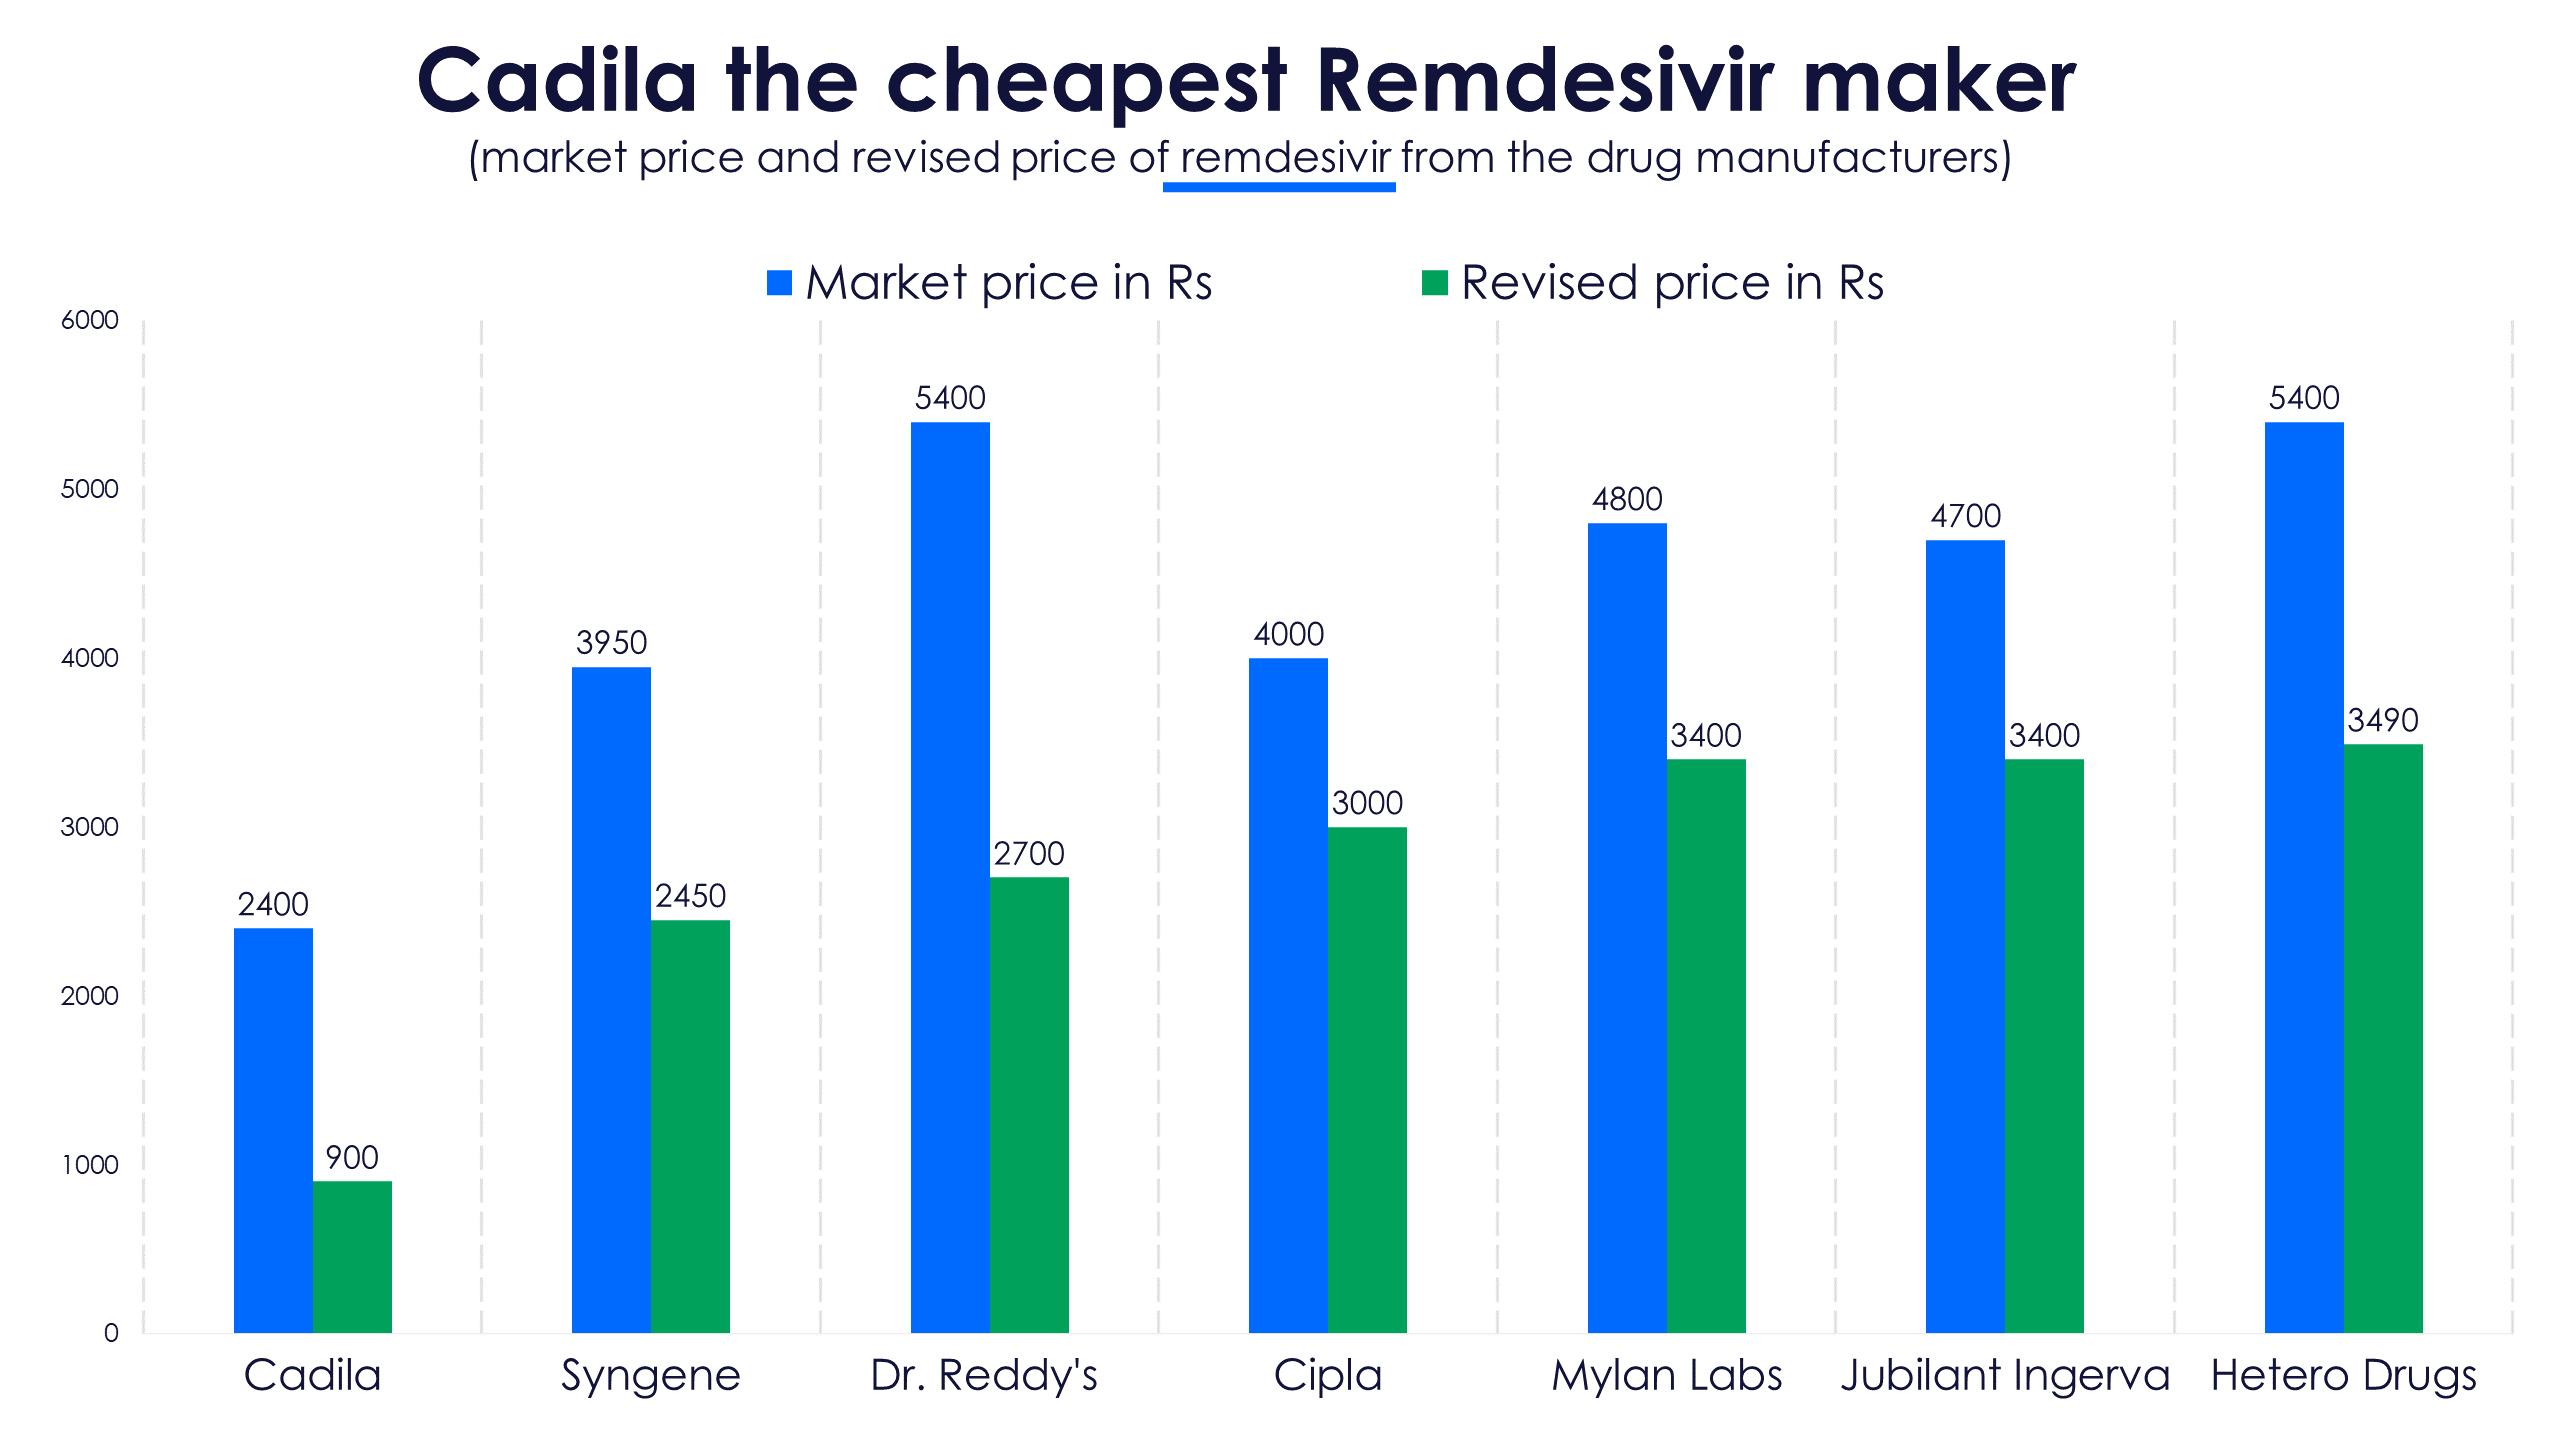 Remdesivir maker prices